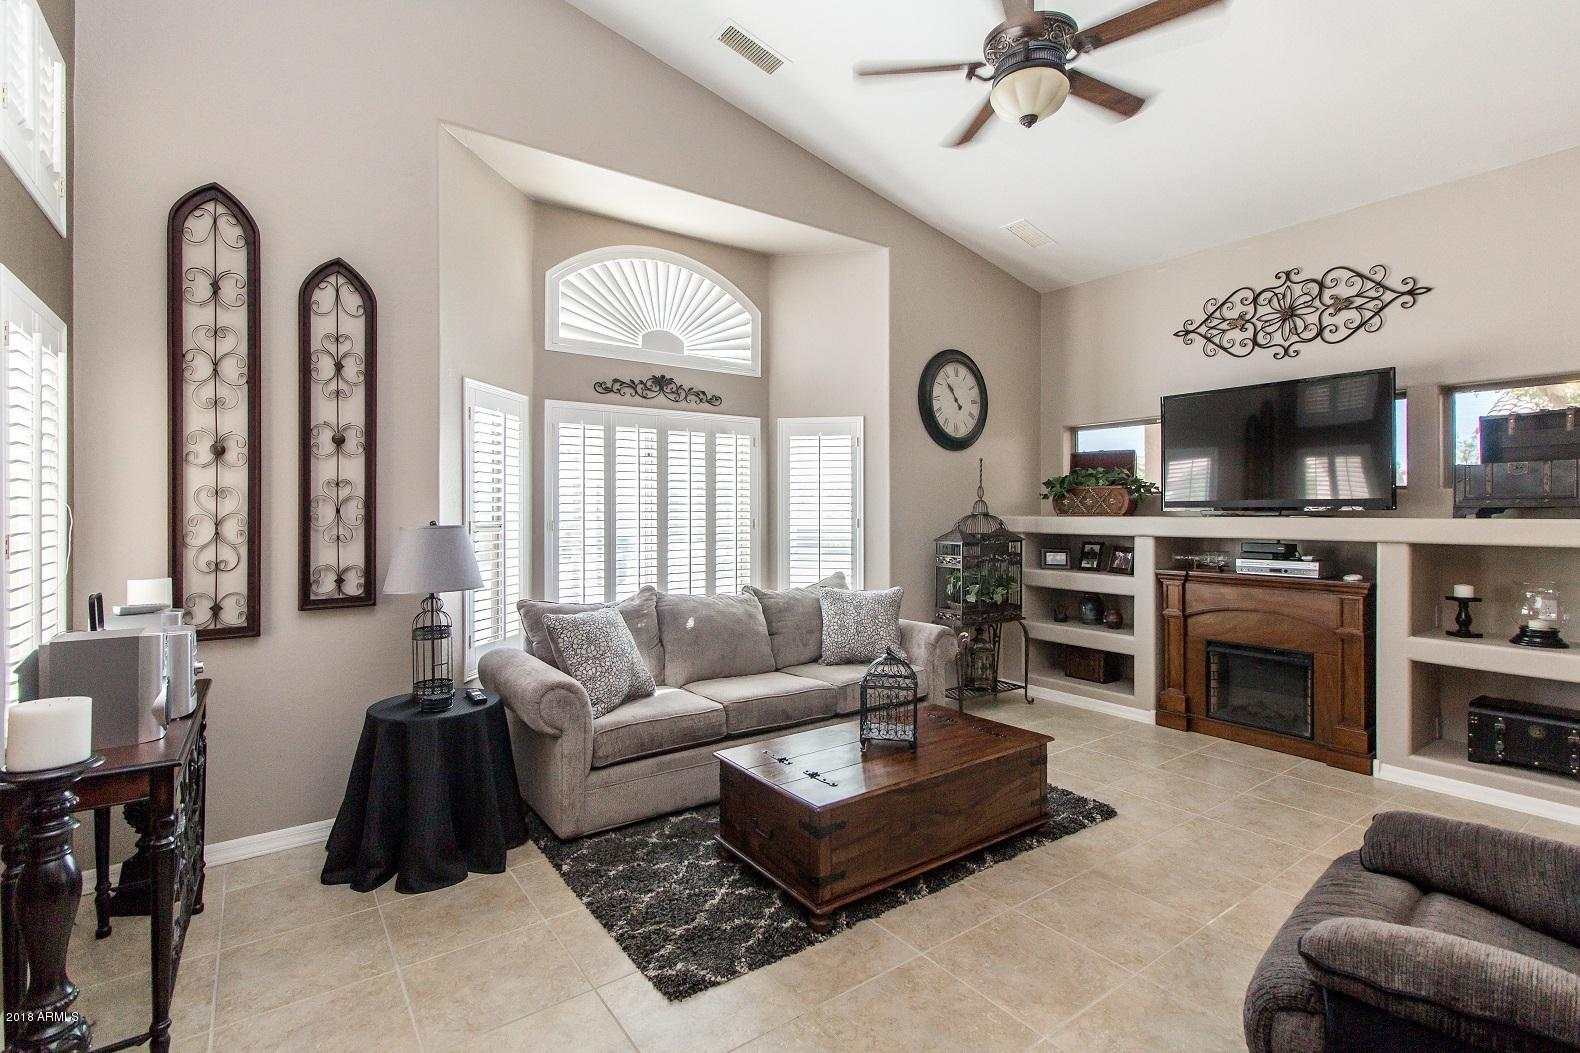 Photo for 1589 E Manor Drive, Casa Grande, AZ 85122 (MLS # 5815339)